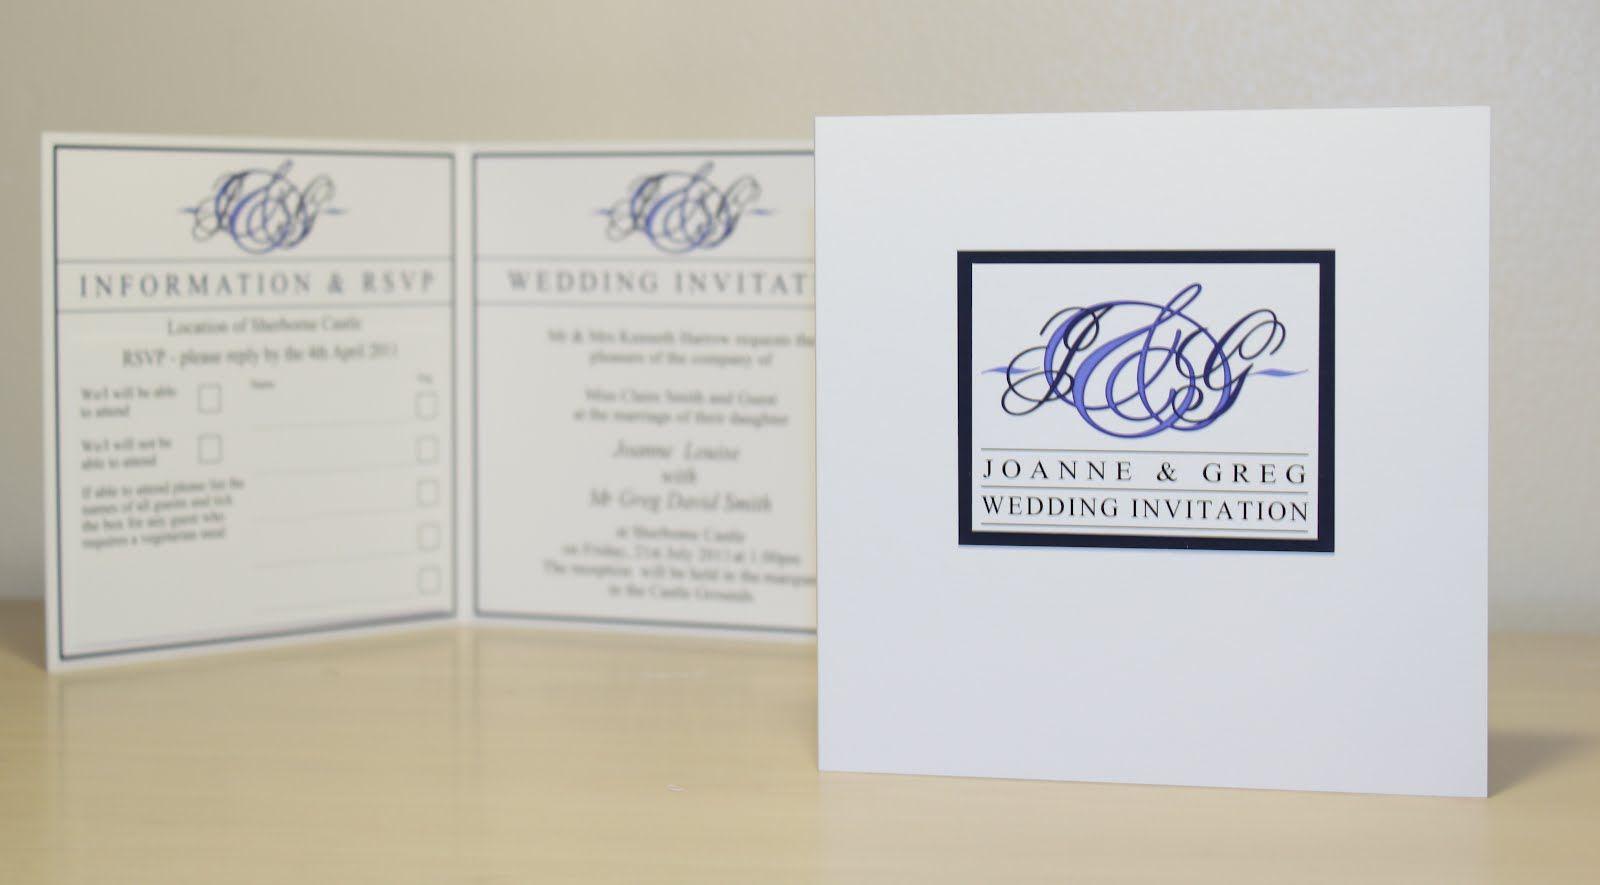 genoa bifold wedding invitations in blue blue wedding detail